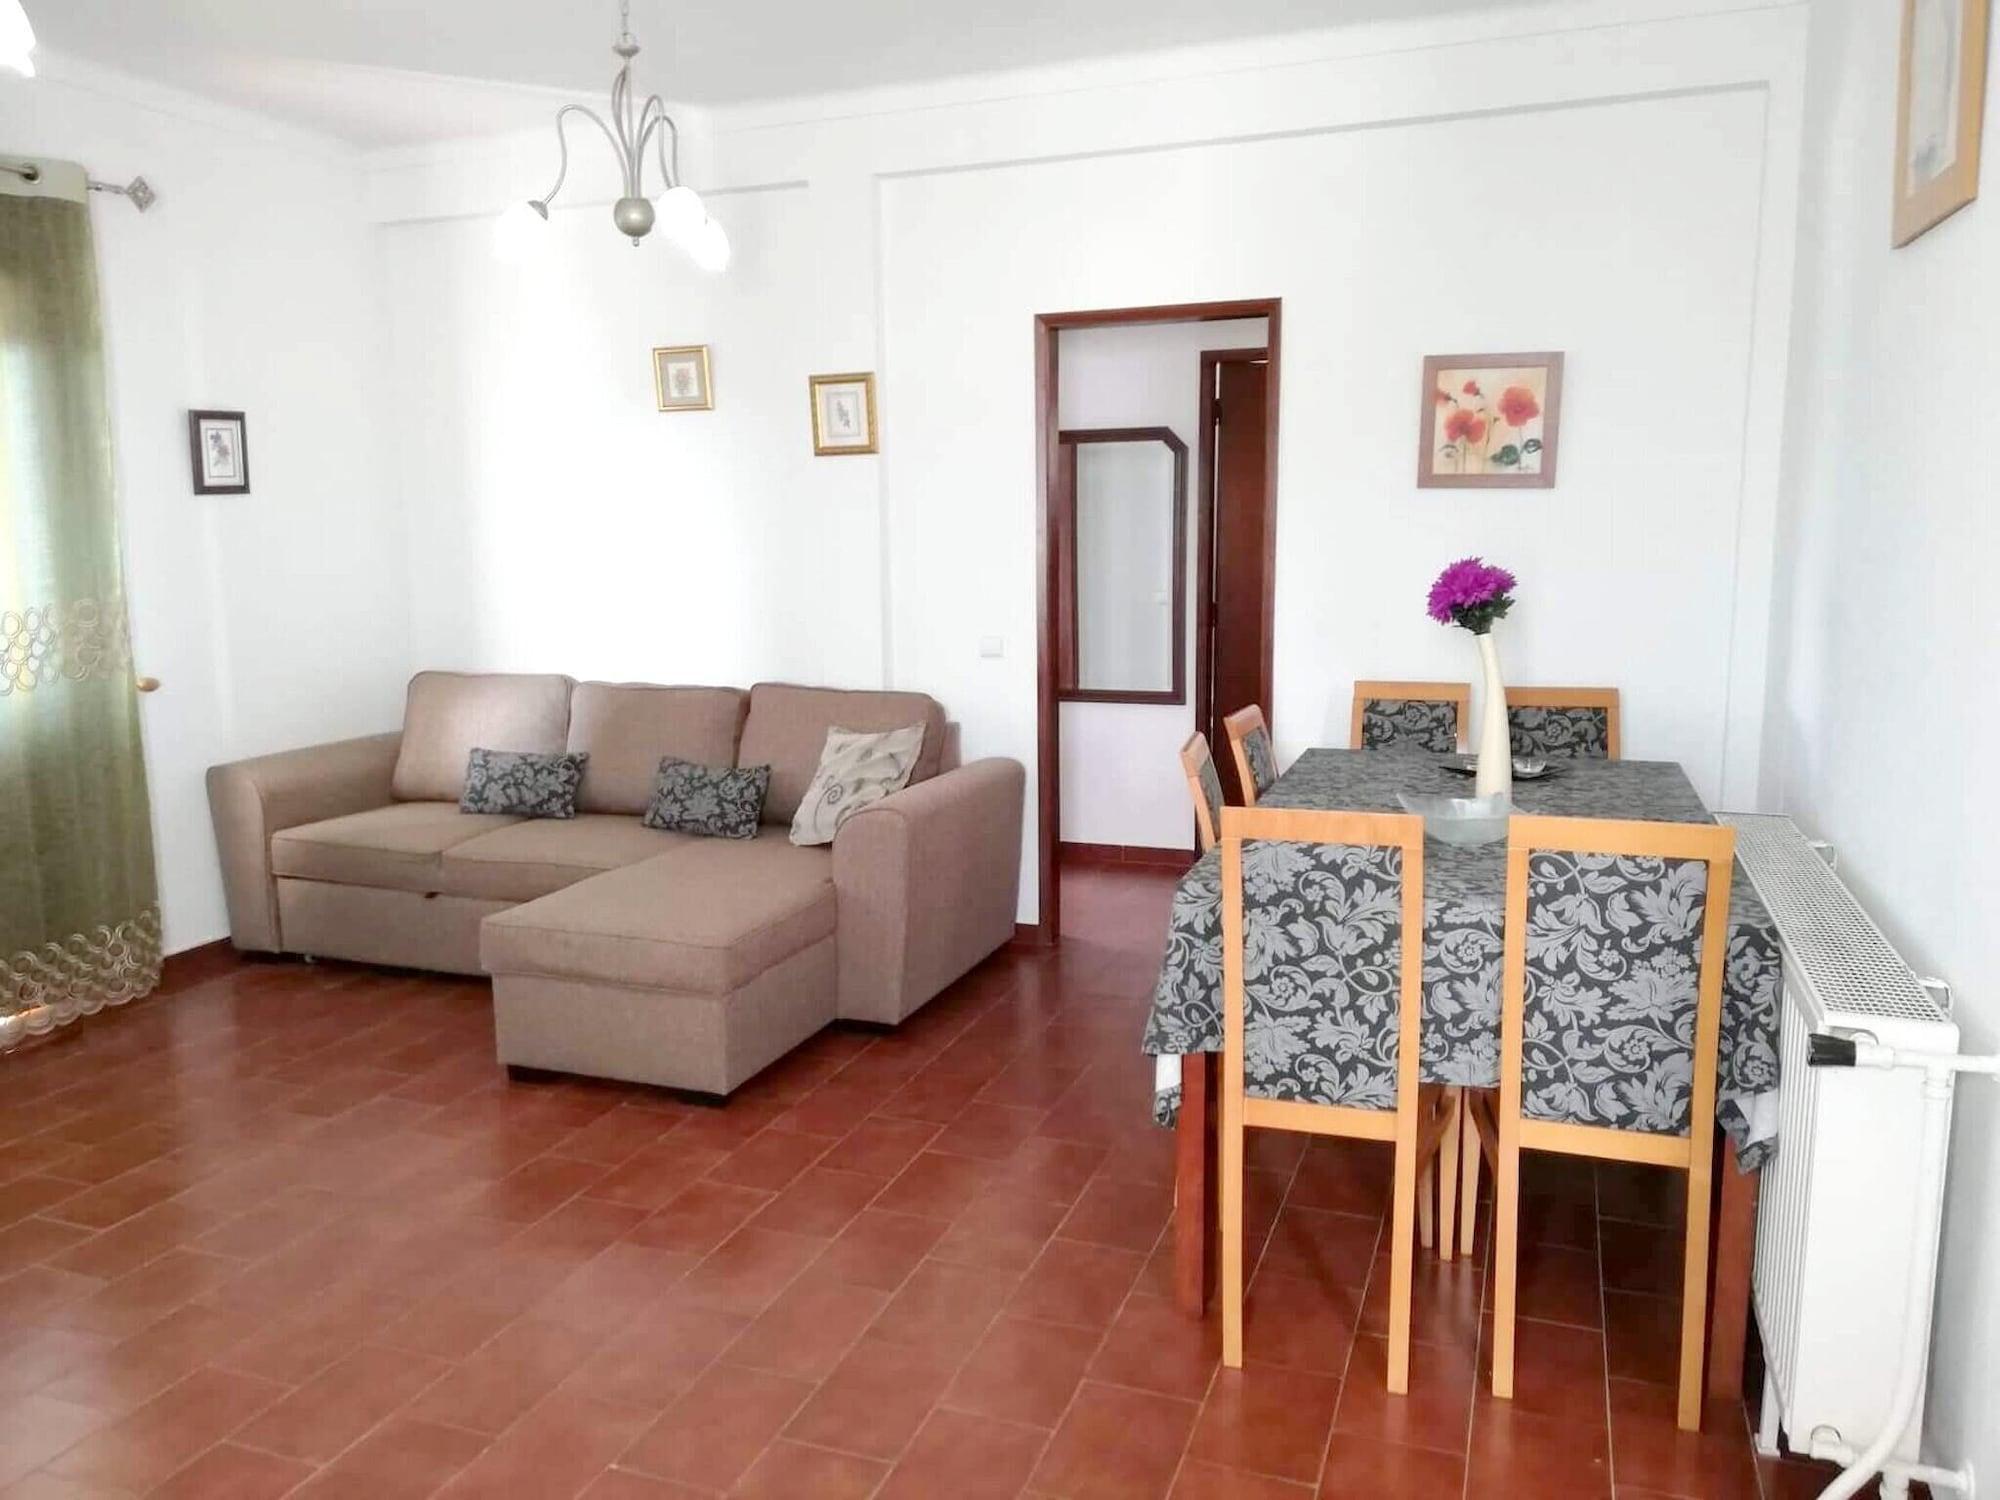 House With 3 Bedrooms in Vila Nova de Cacela, With Pool Access, Enclosed Garden and Wifi - 1 km From the Beach, Vila Real de Santo António